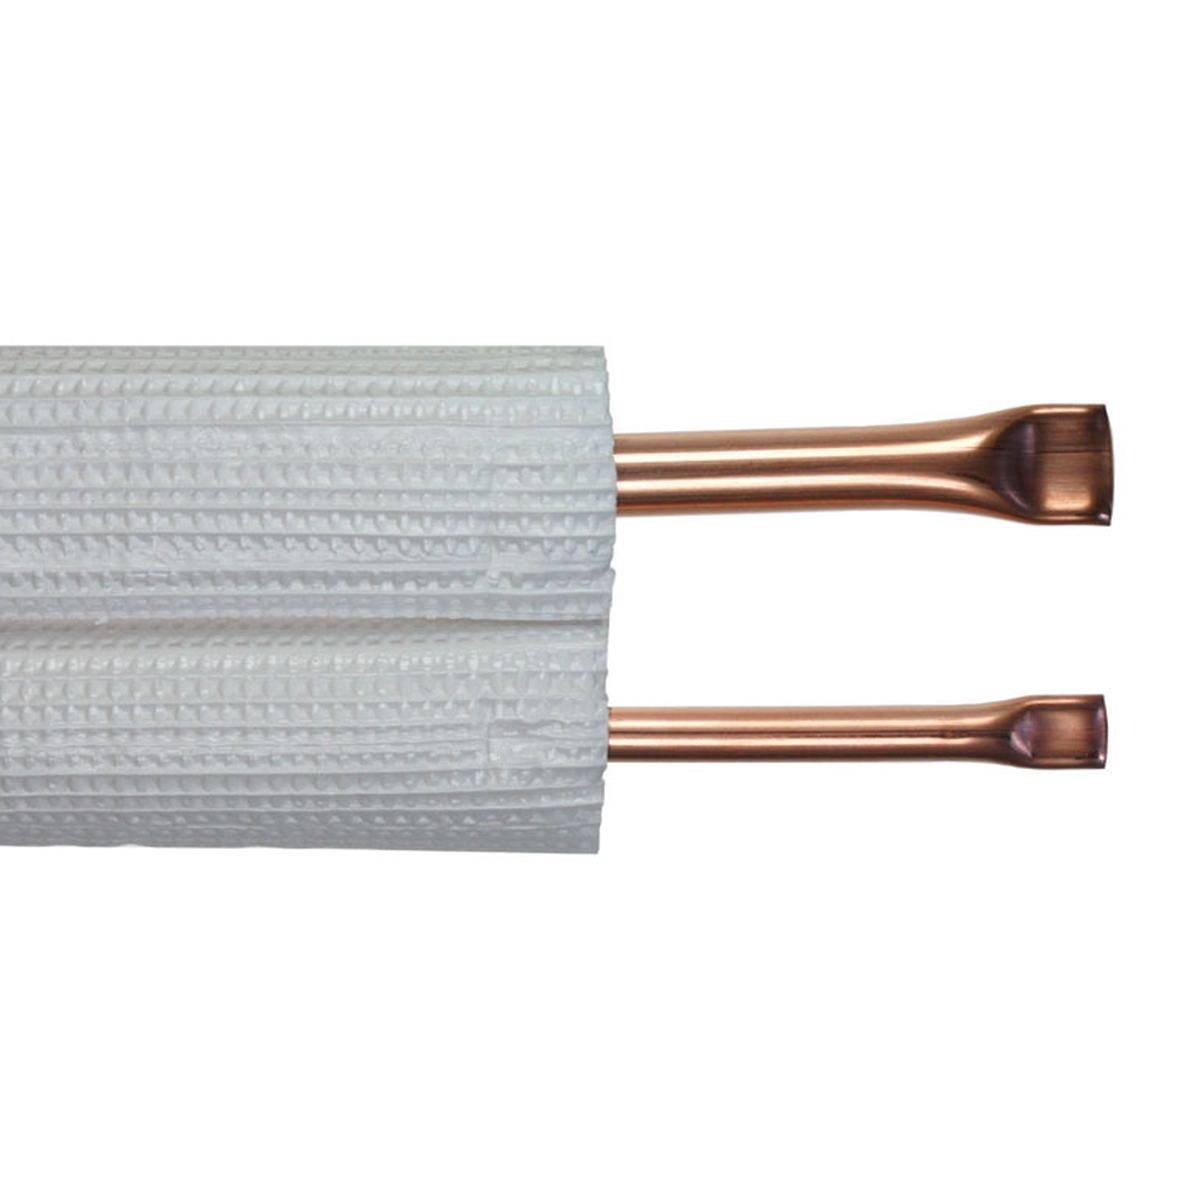 "Kobberrør isol. 3/8"" x 0,8 mm + 5/8"" x 1,0 mm 20 m"